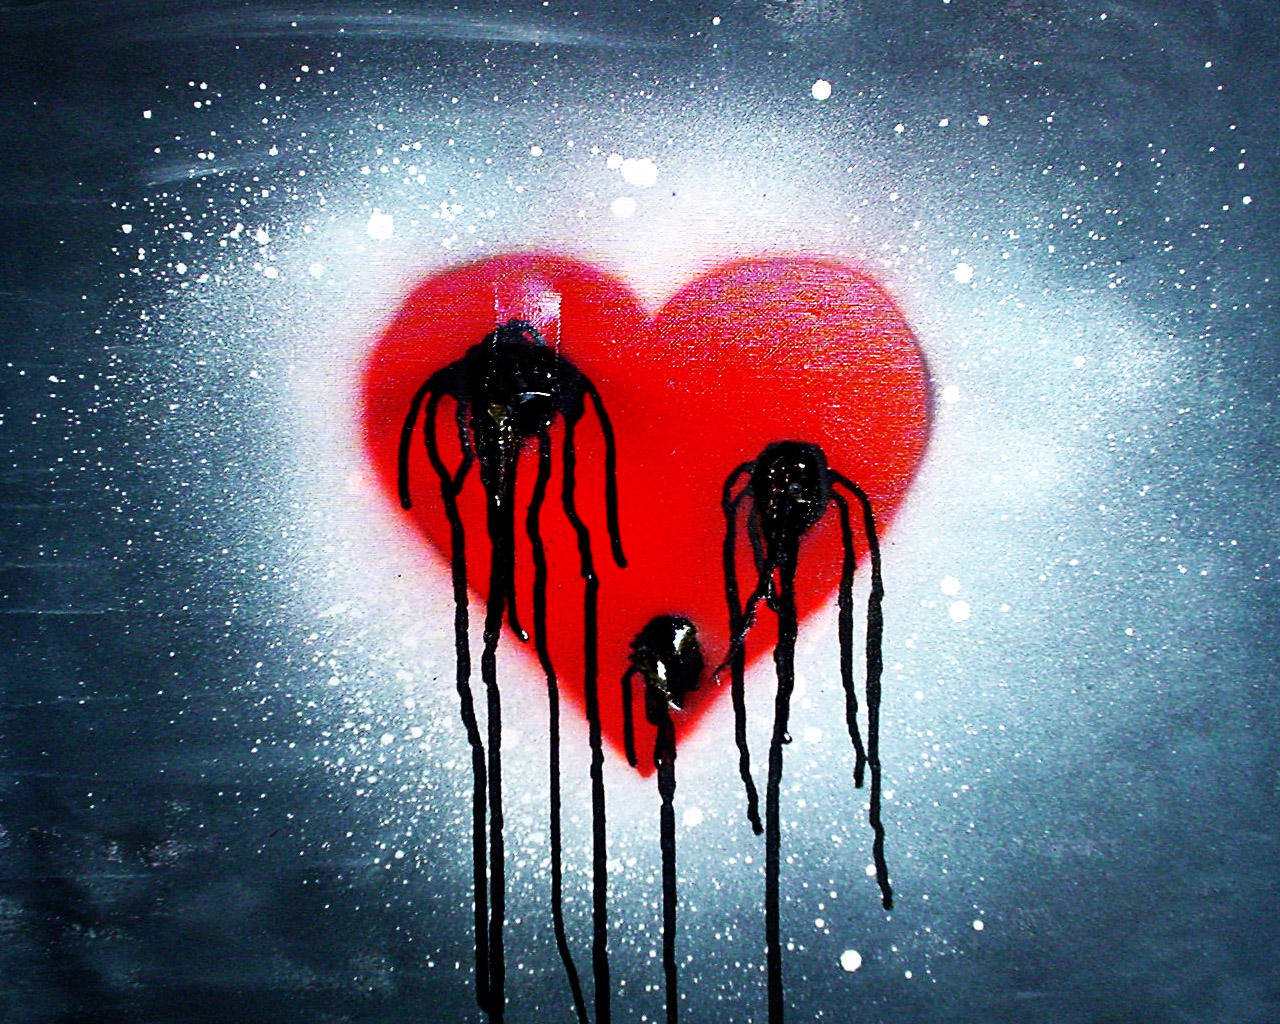 Love Blood Heart Wallpaper : Bleeding Heart by lukebarfoot on DeviantArt